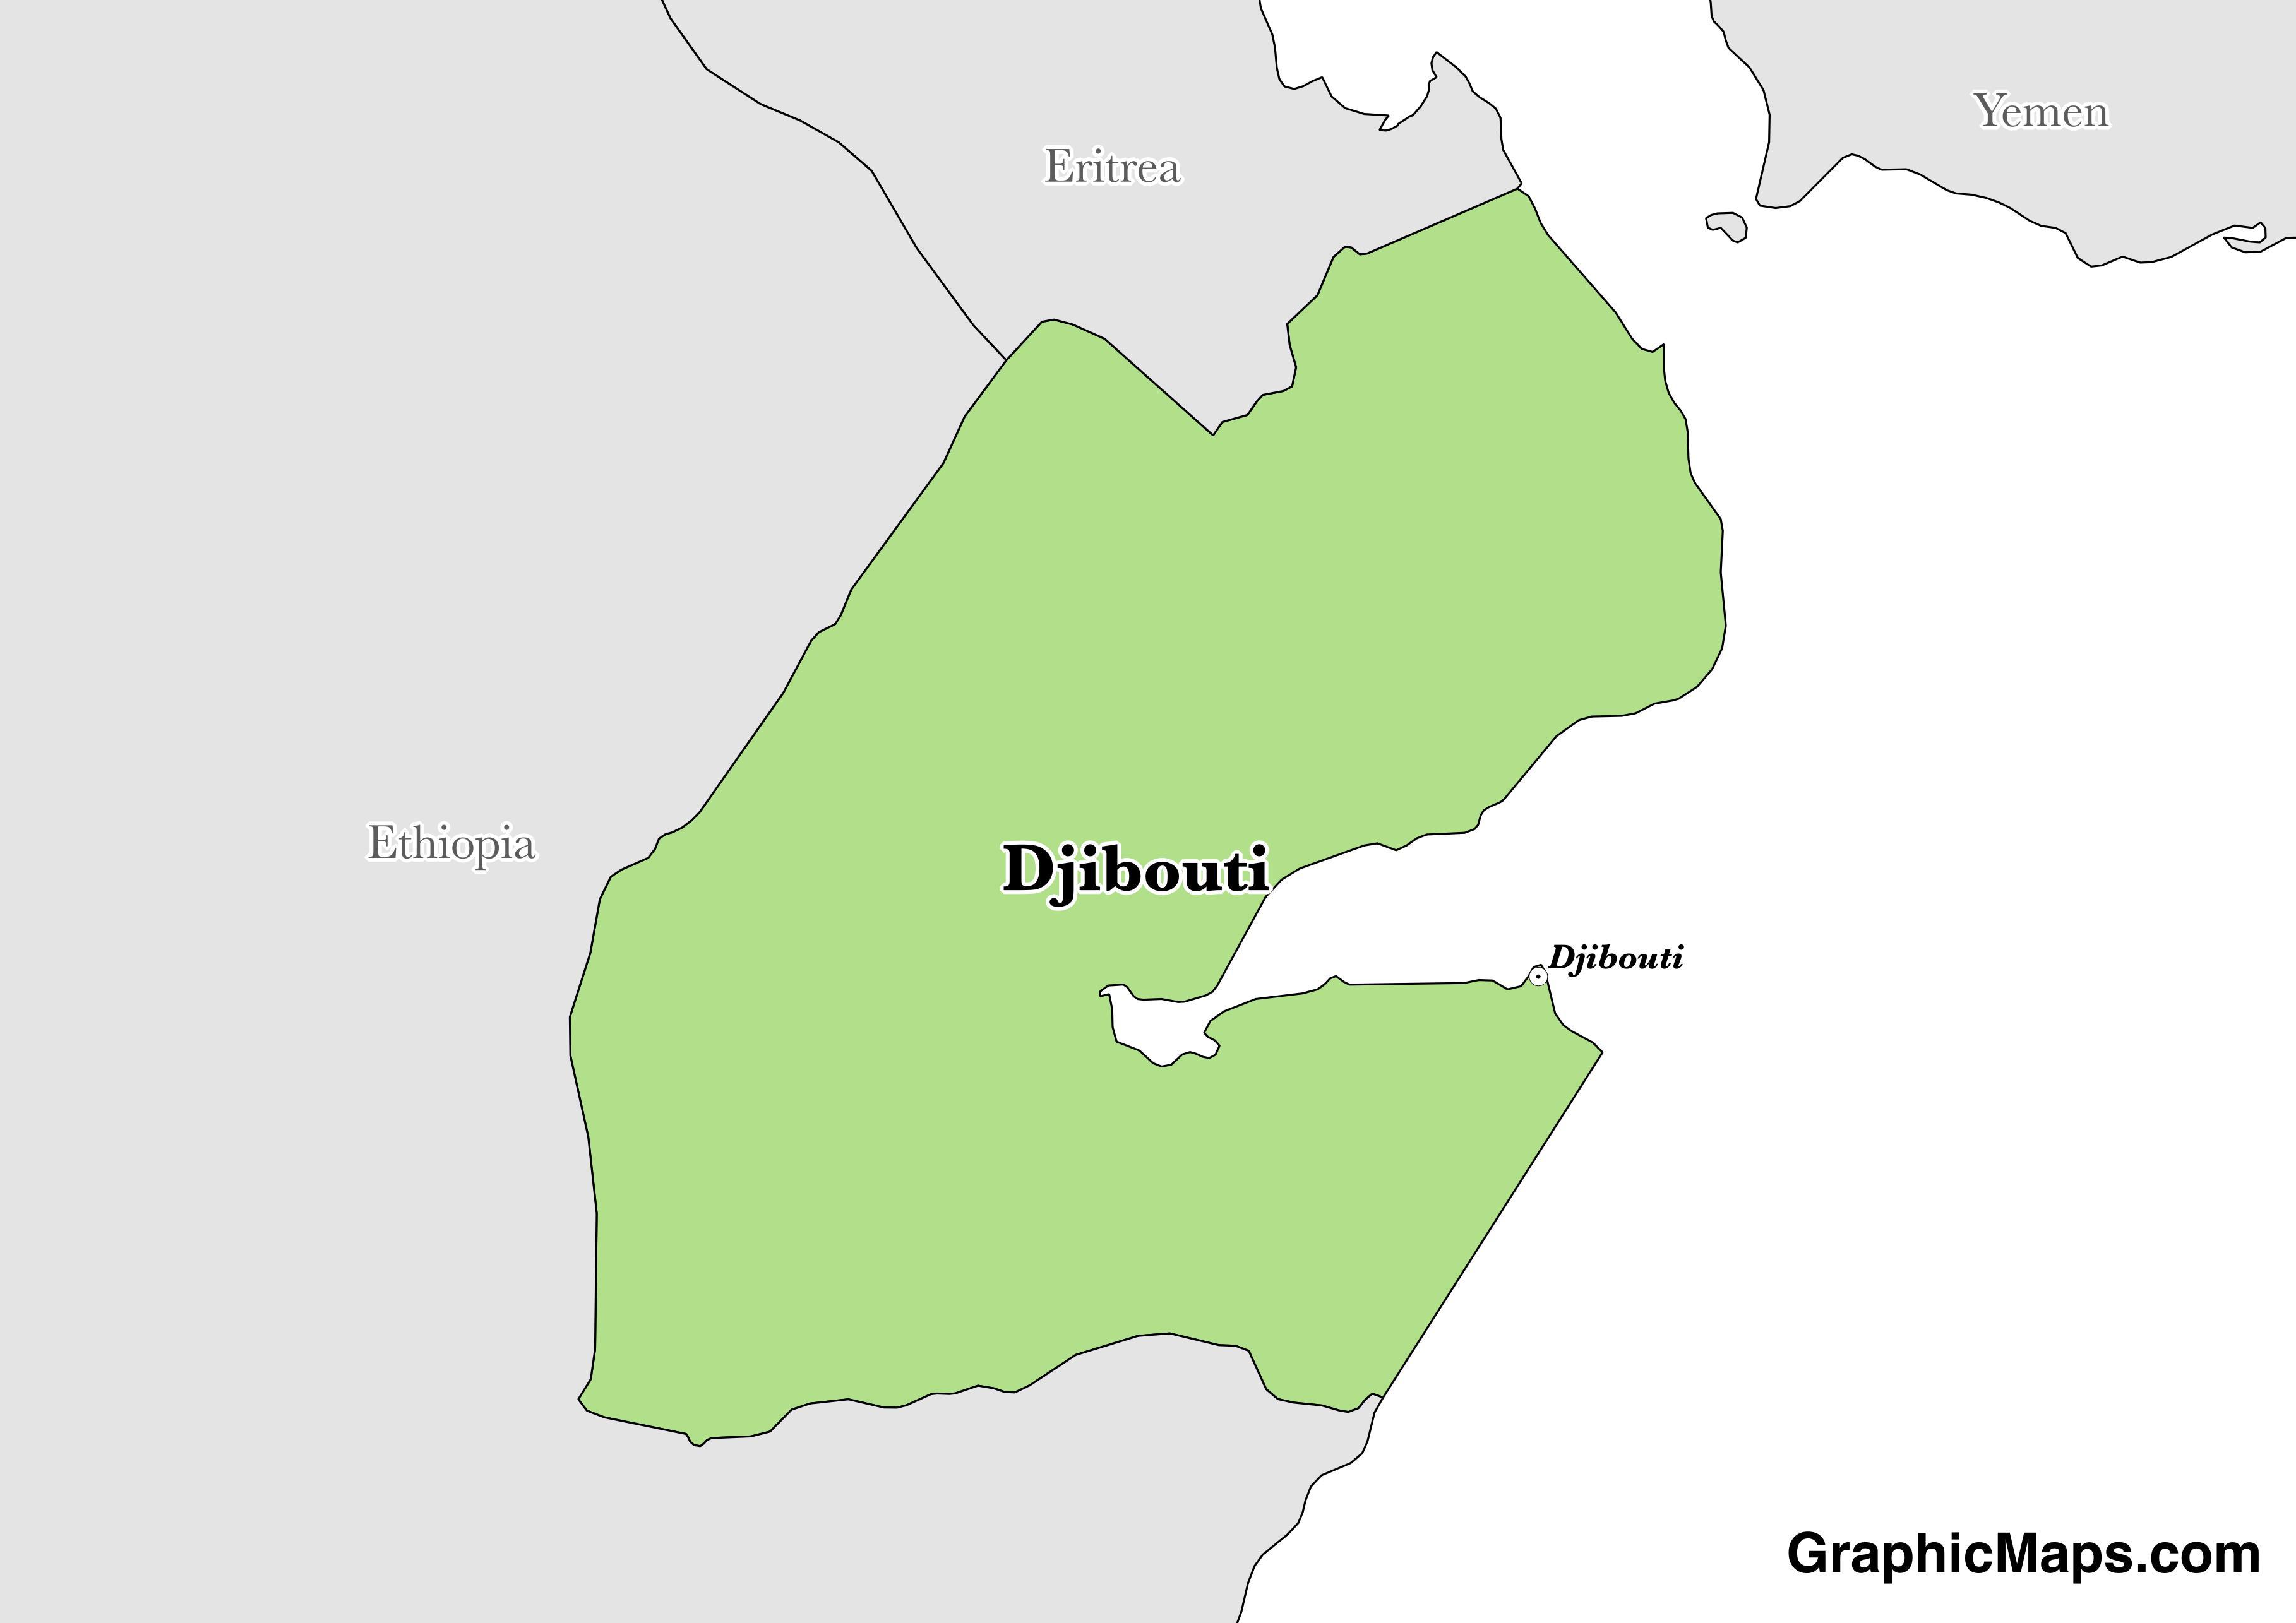 Djibouti / GraphicMaps.com